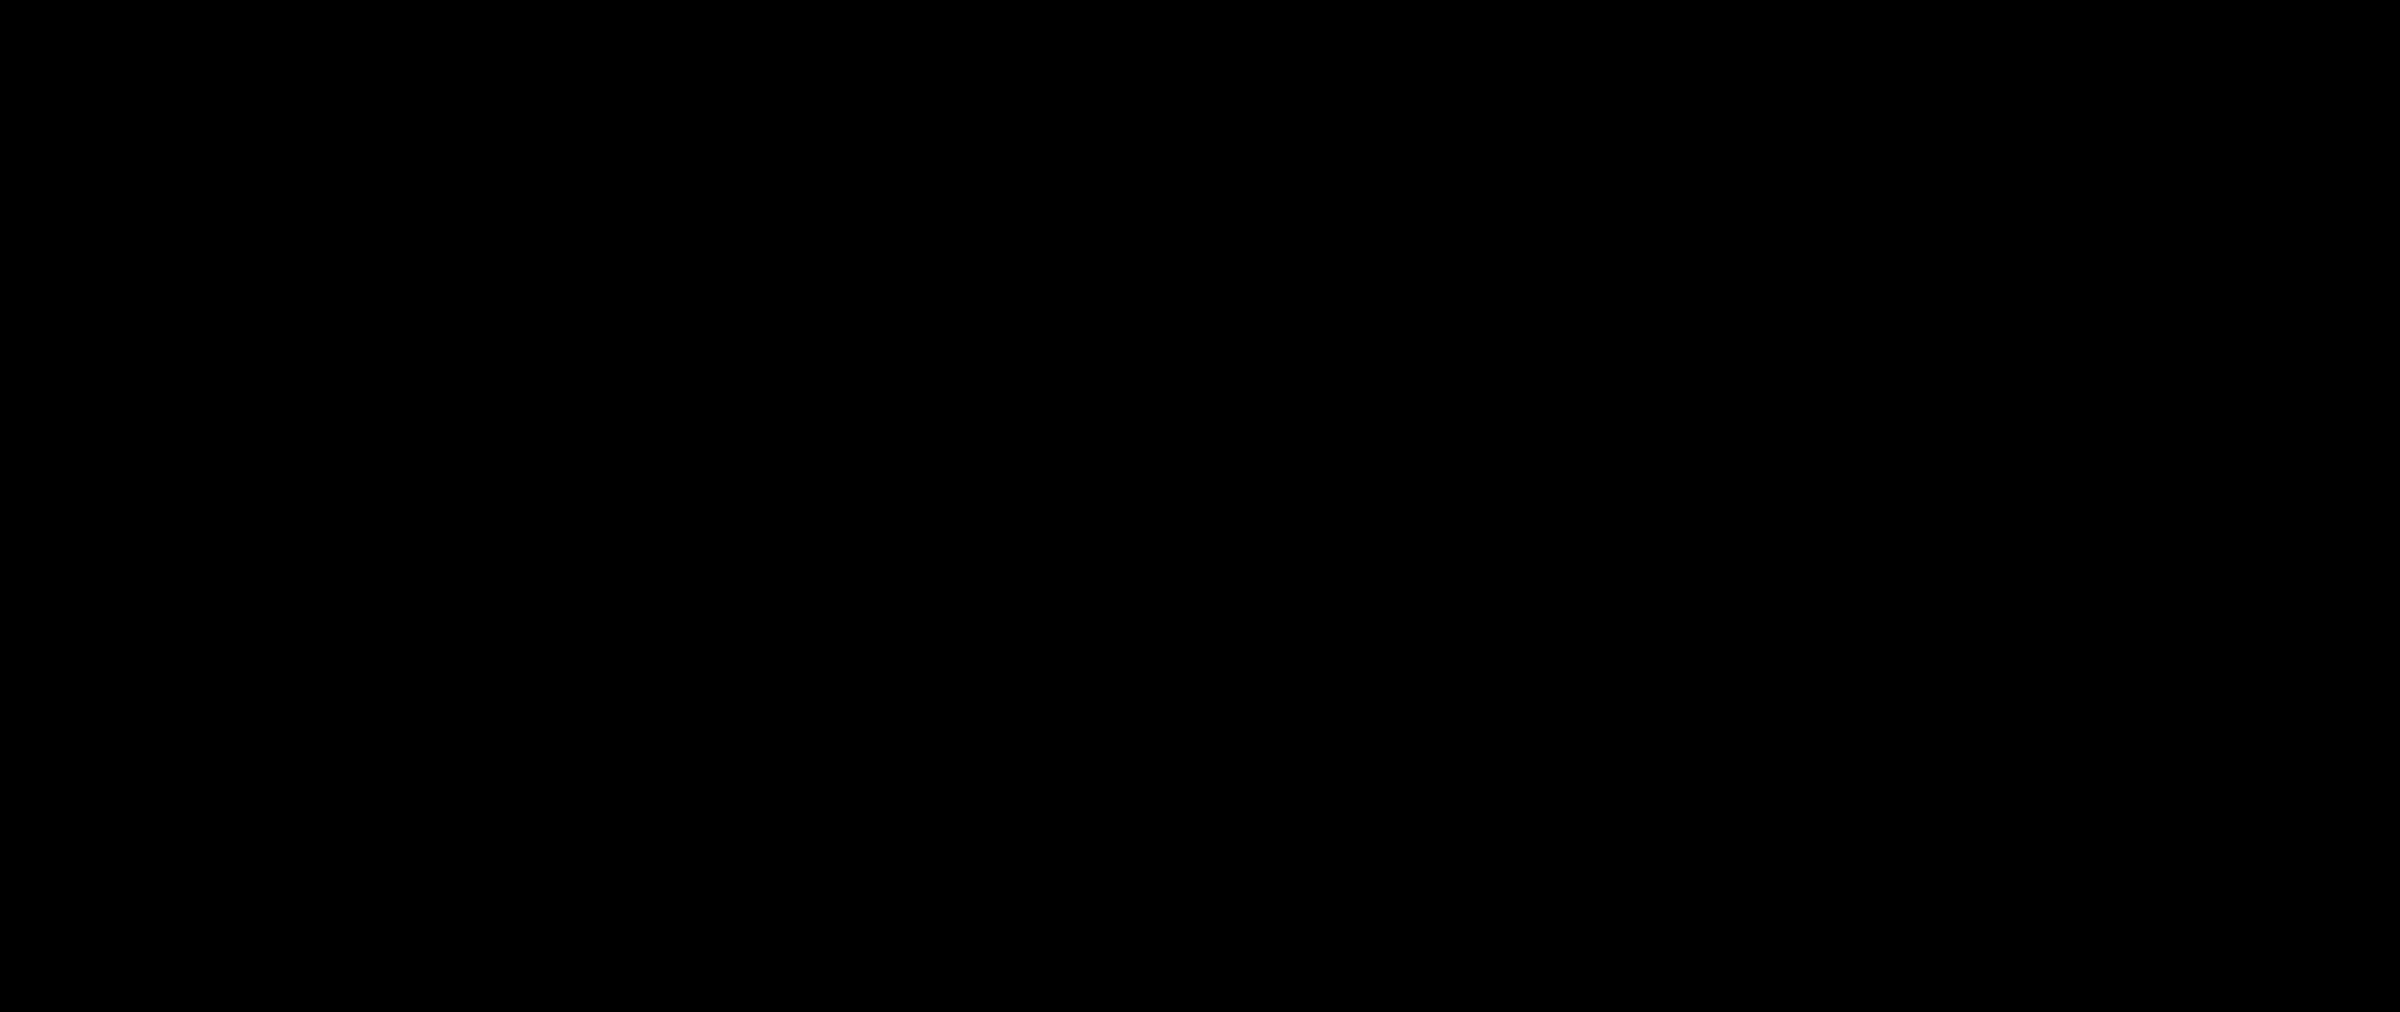 clip art transparent stock Clipart